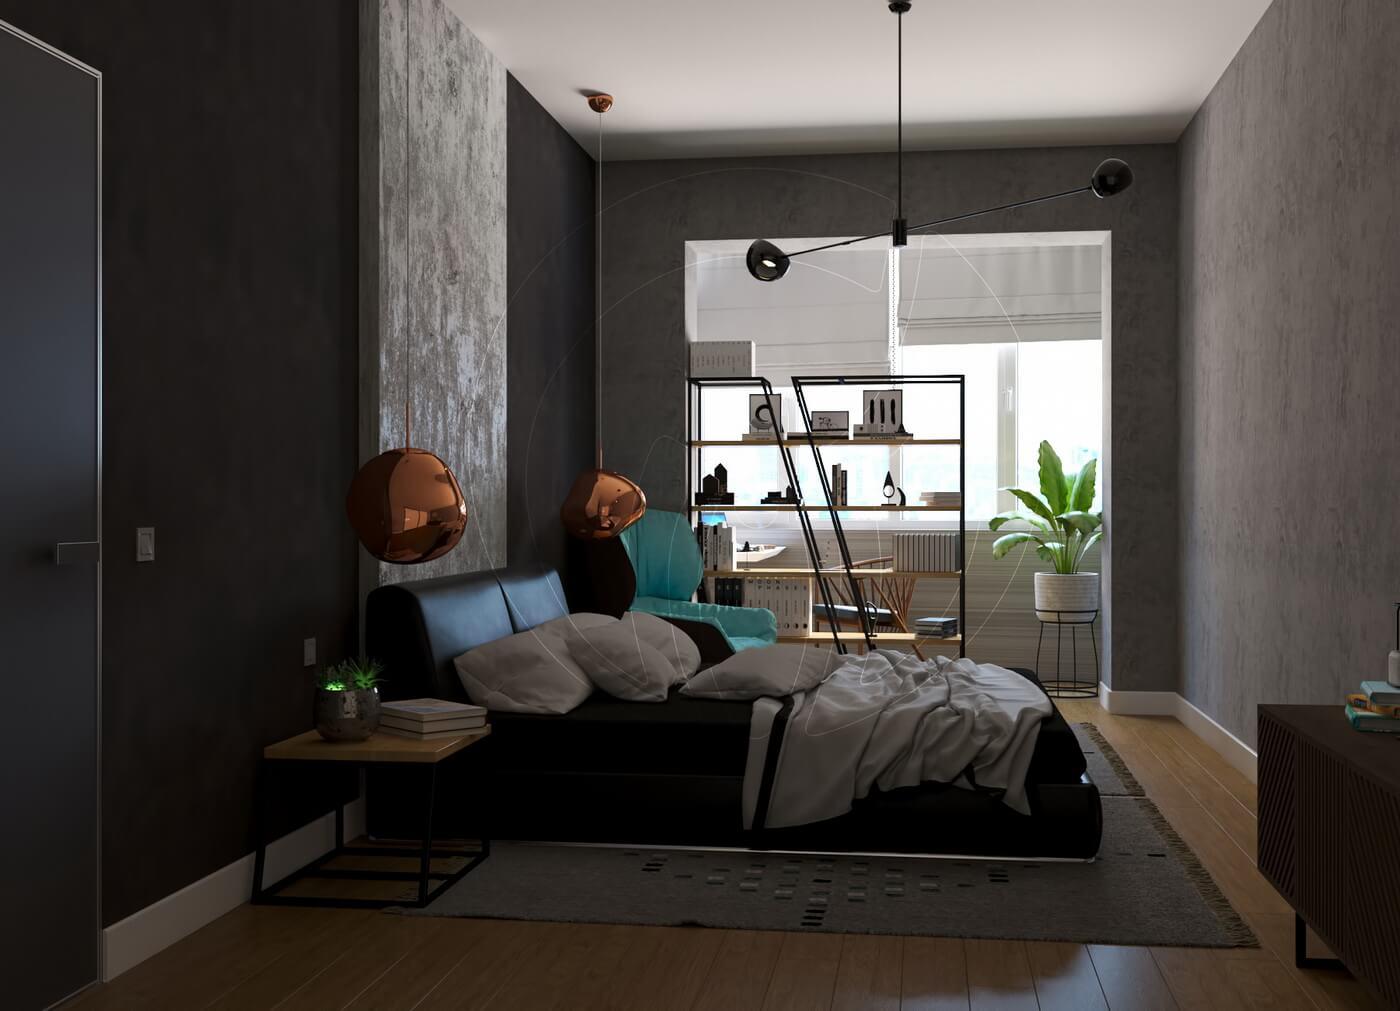 Квартира в скандинавском стиле и стиле LOFT. Спальня в стиле loft